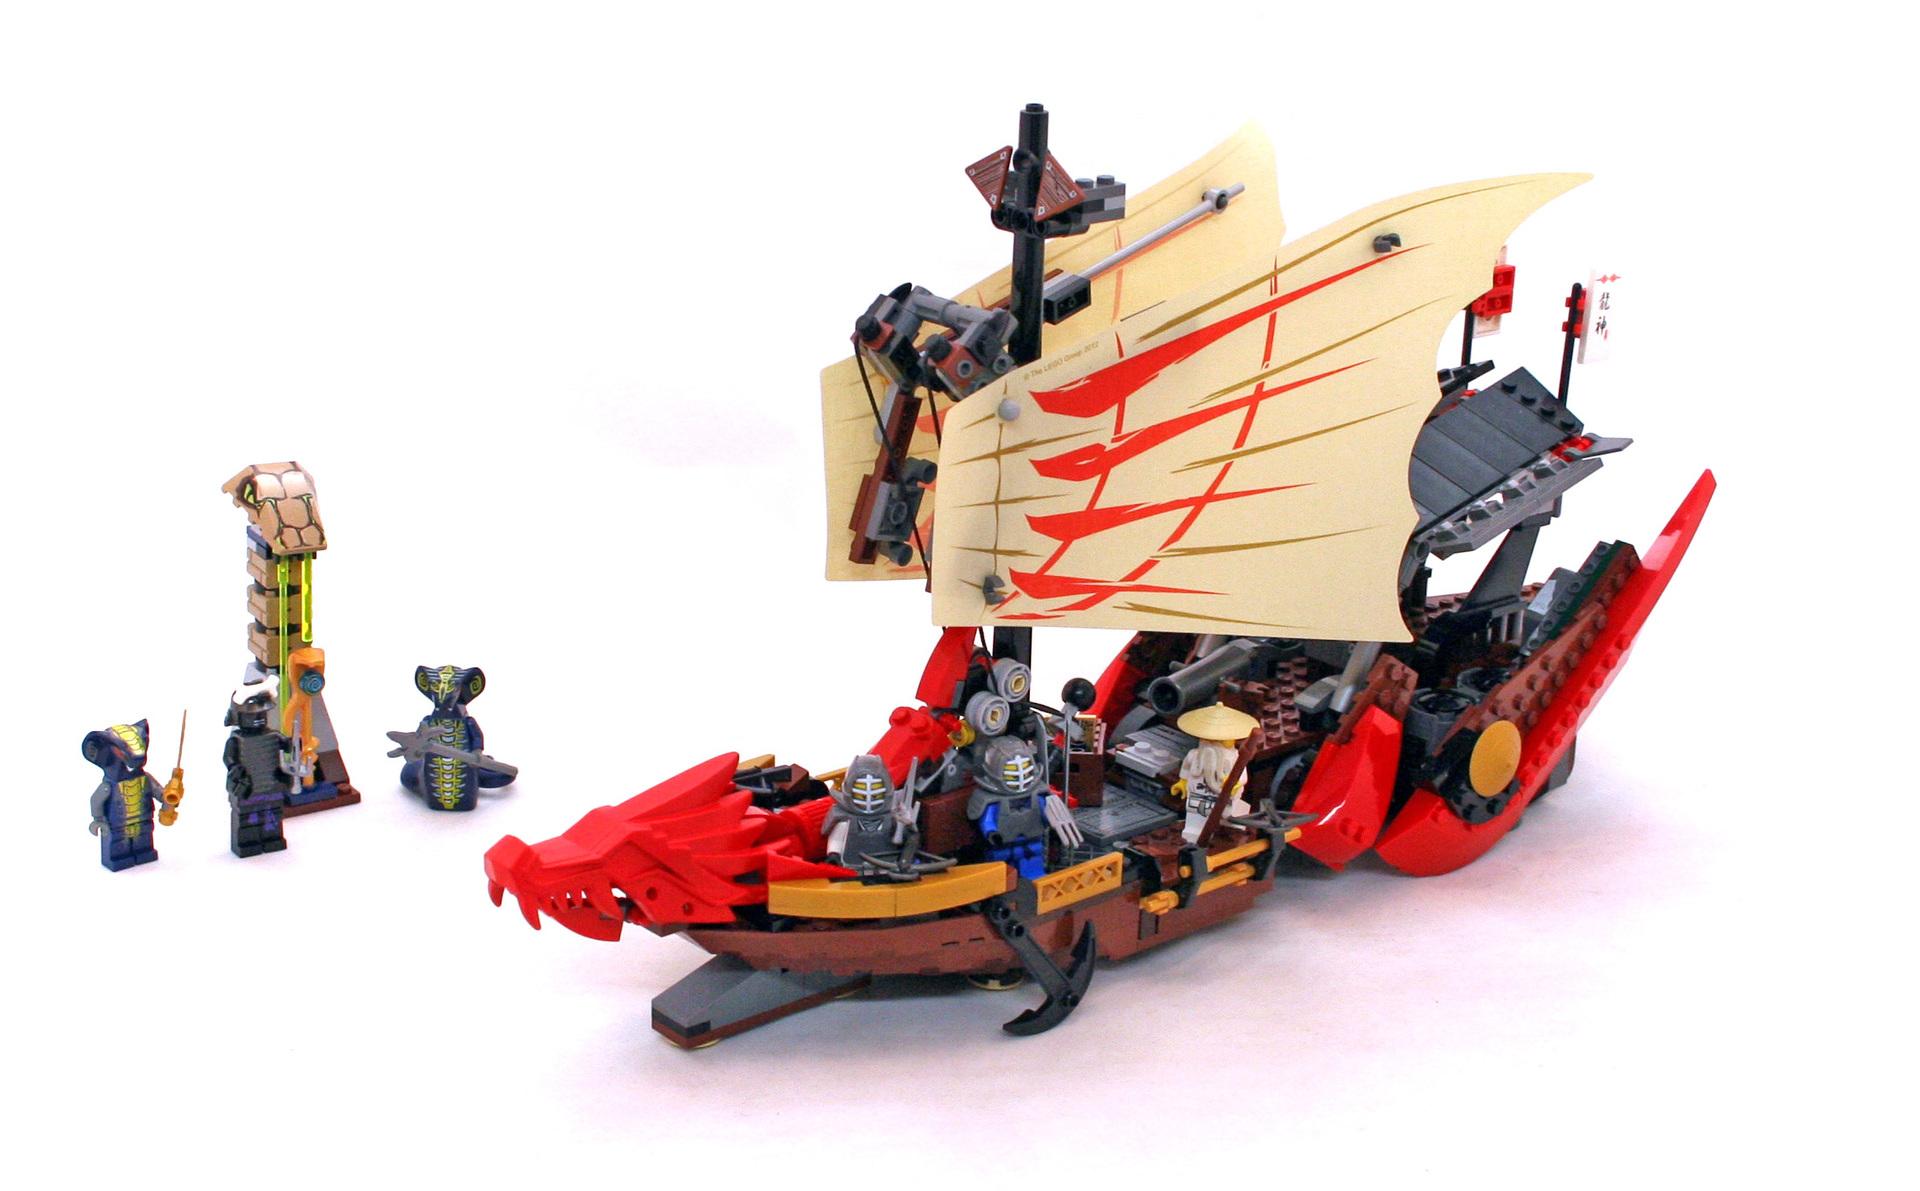 Destiny's Bounty - LEGO set #9446-1 (Building Sets > Ninjago)